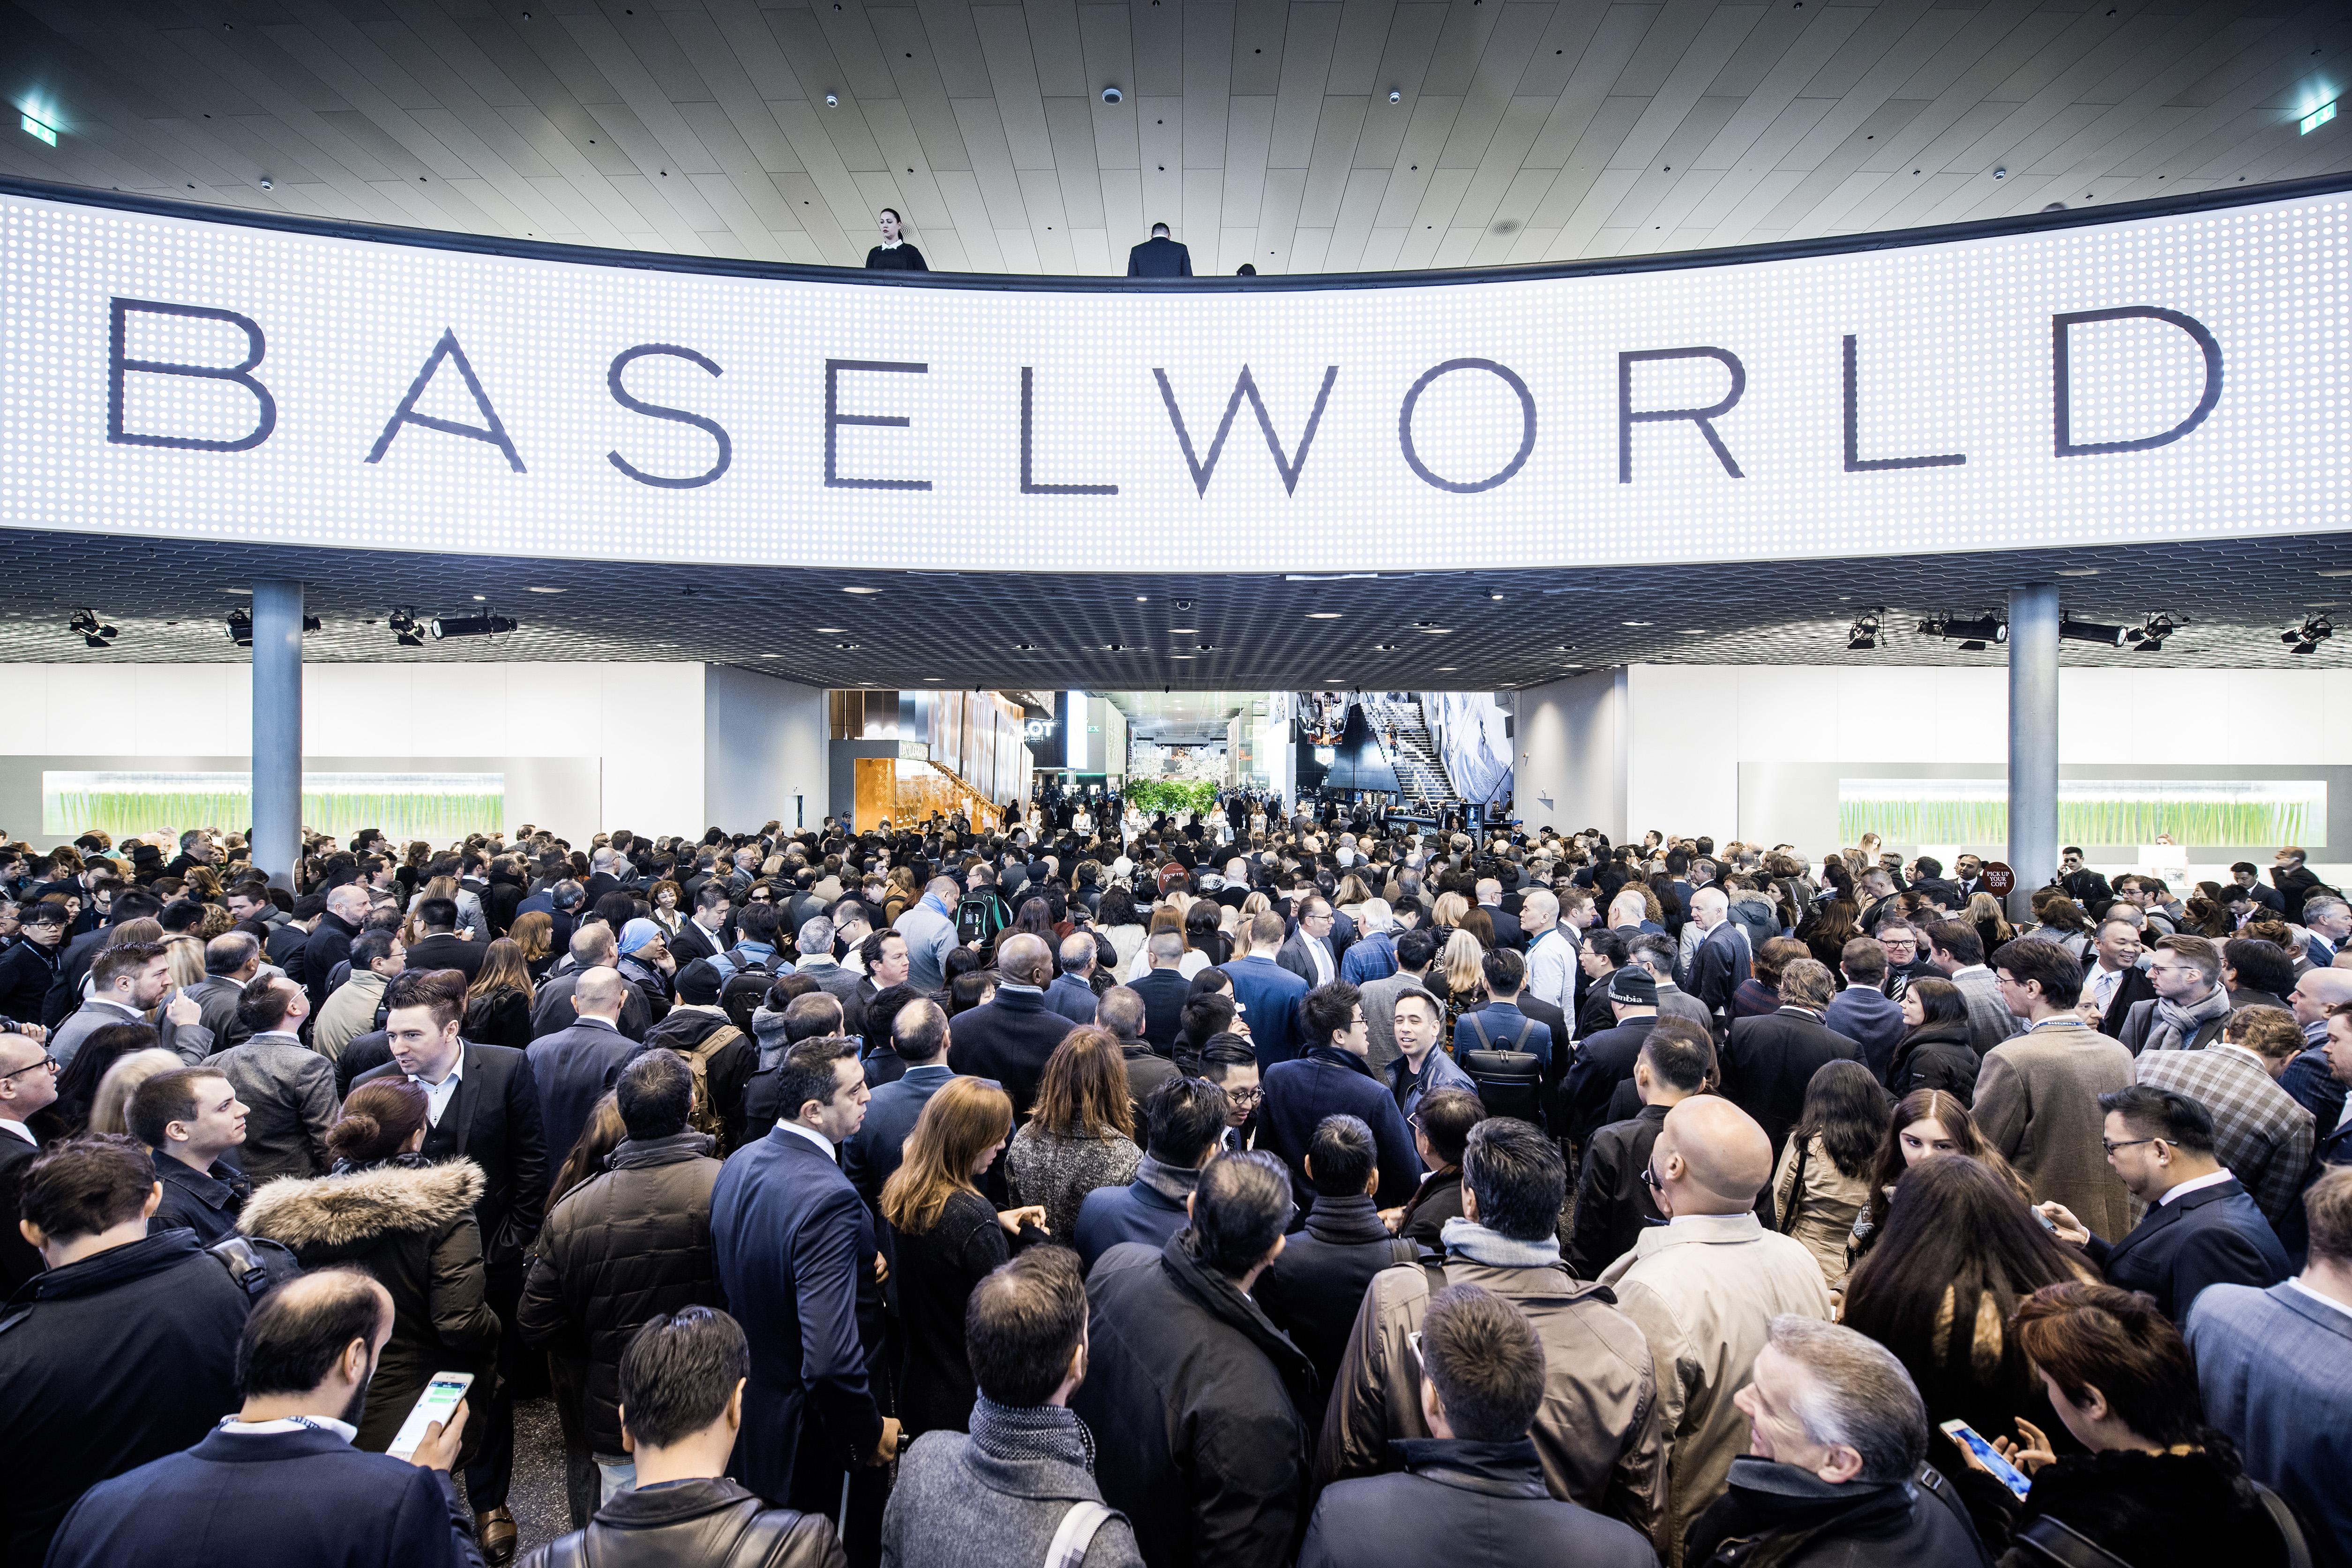 Baselworld 2016